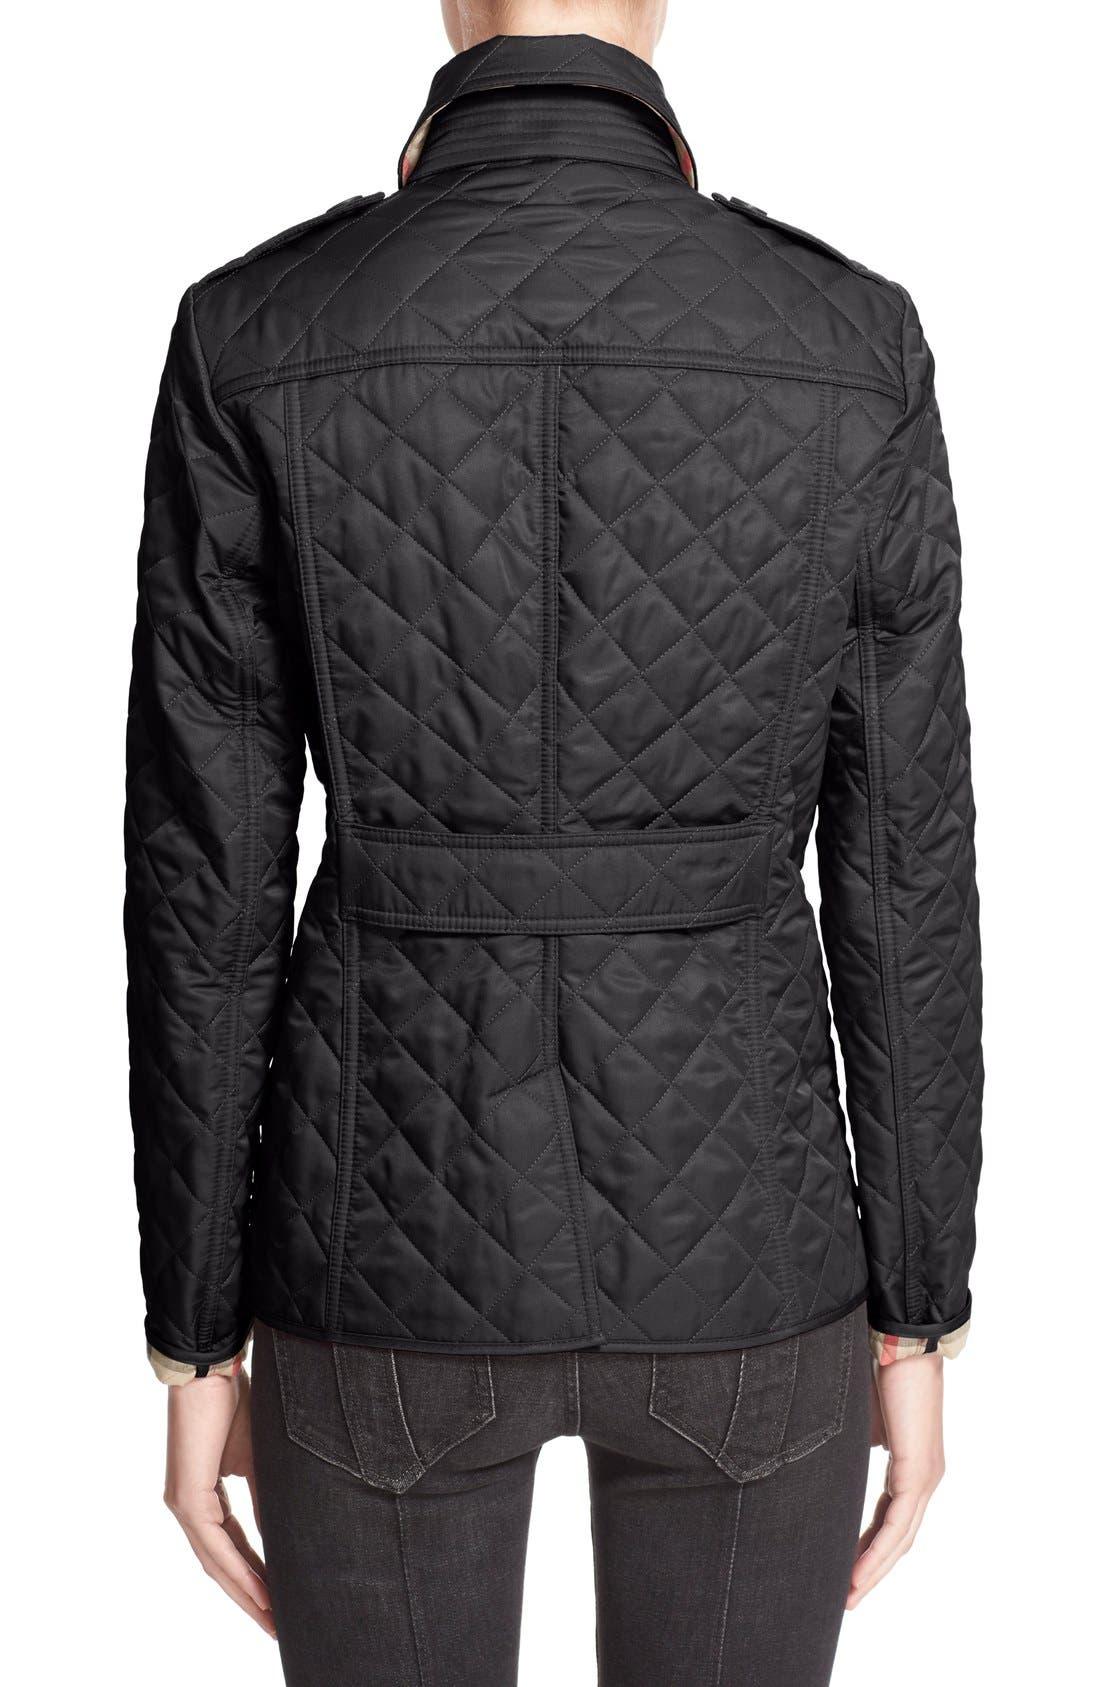 Ashurst Quilted Jacket,                             Alternate thumbnail 9, color,                             BLACK